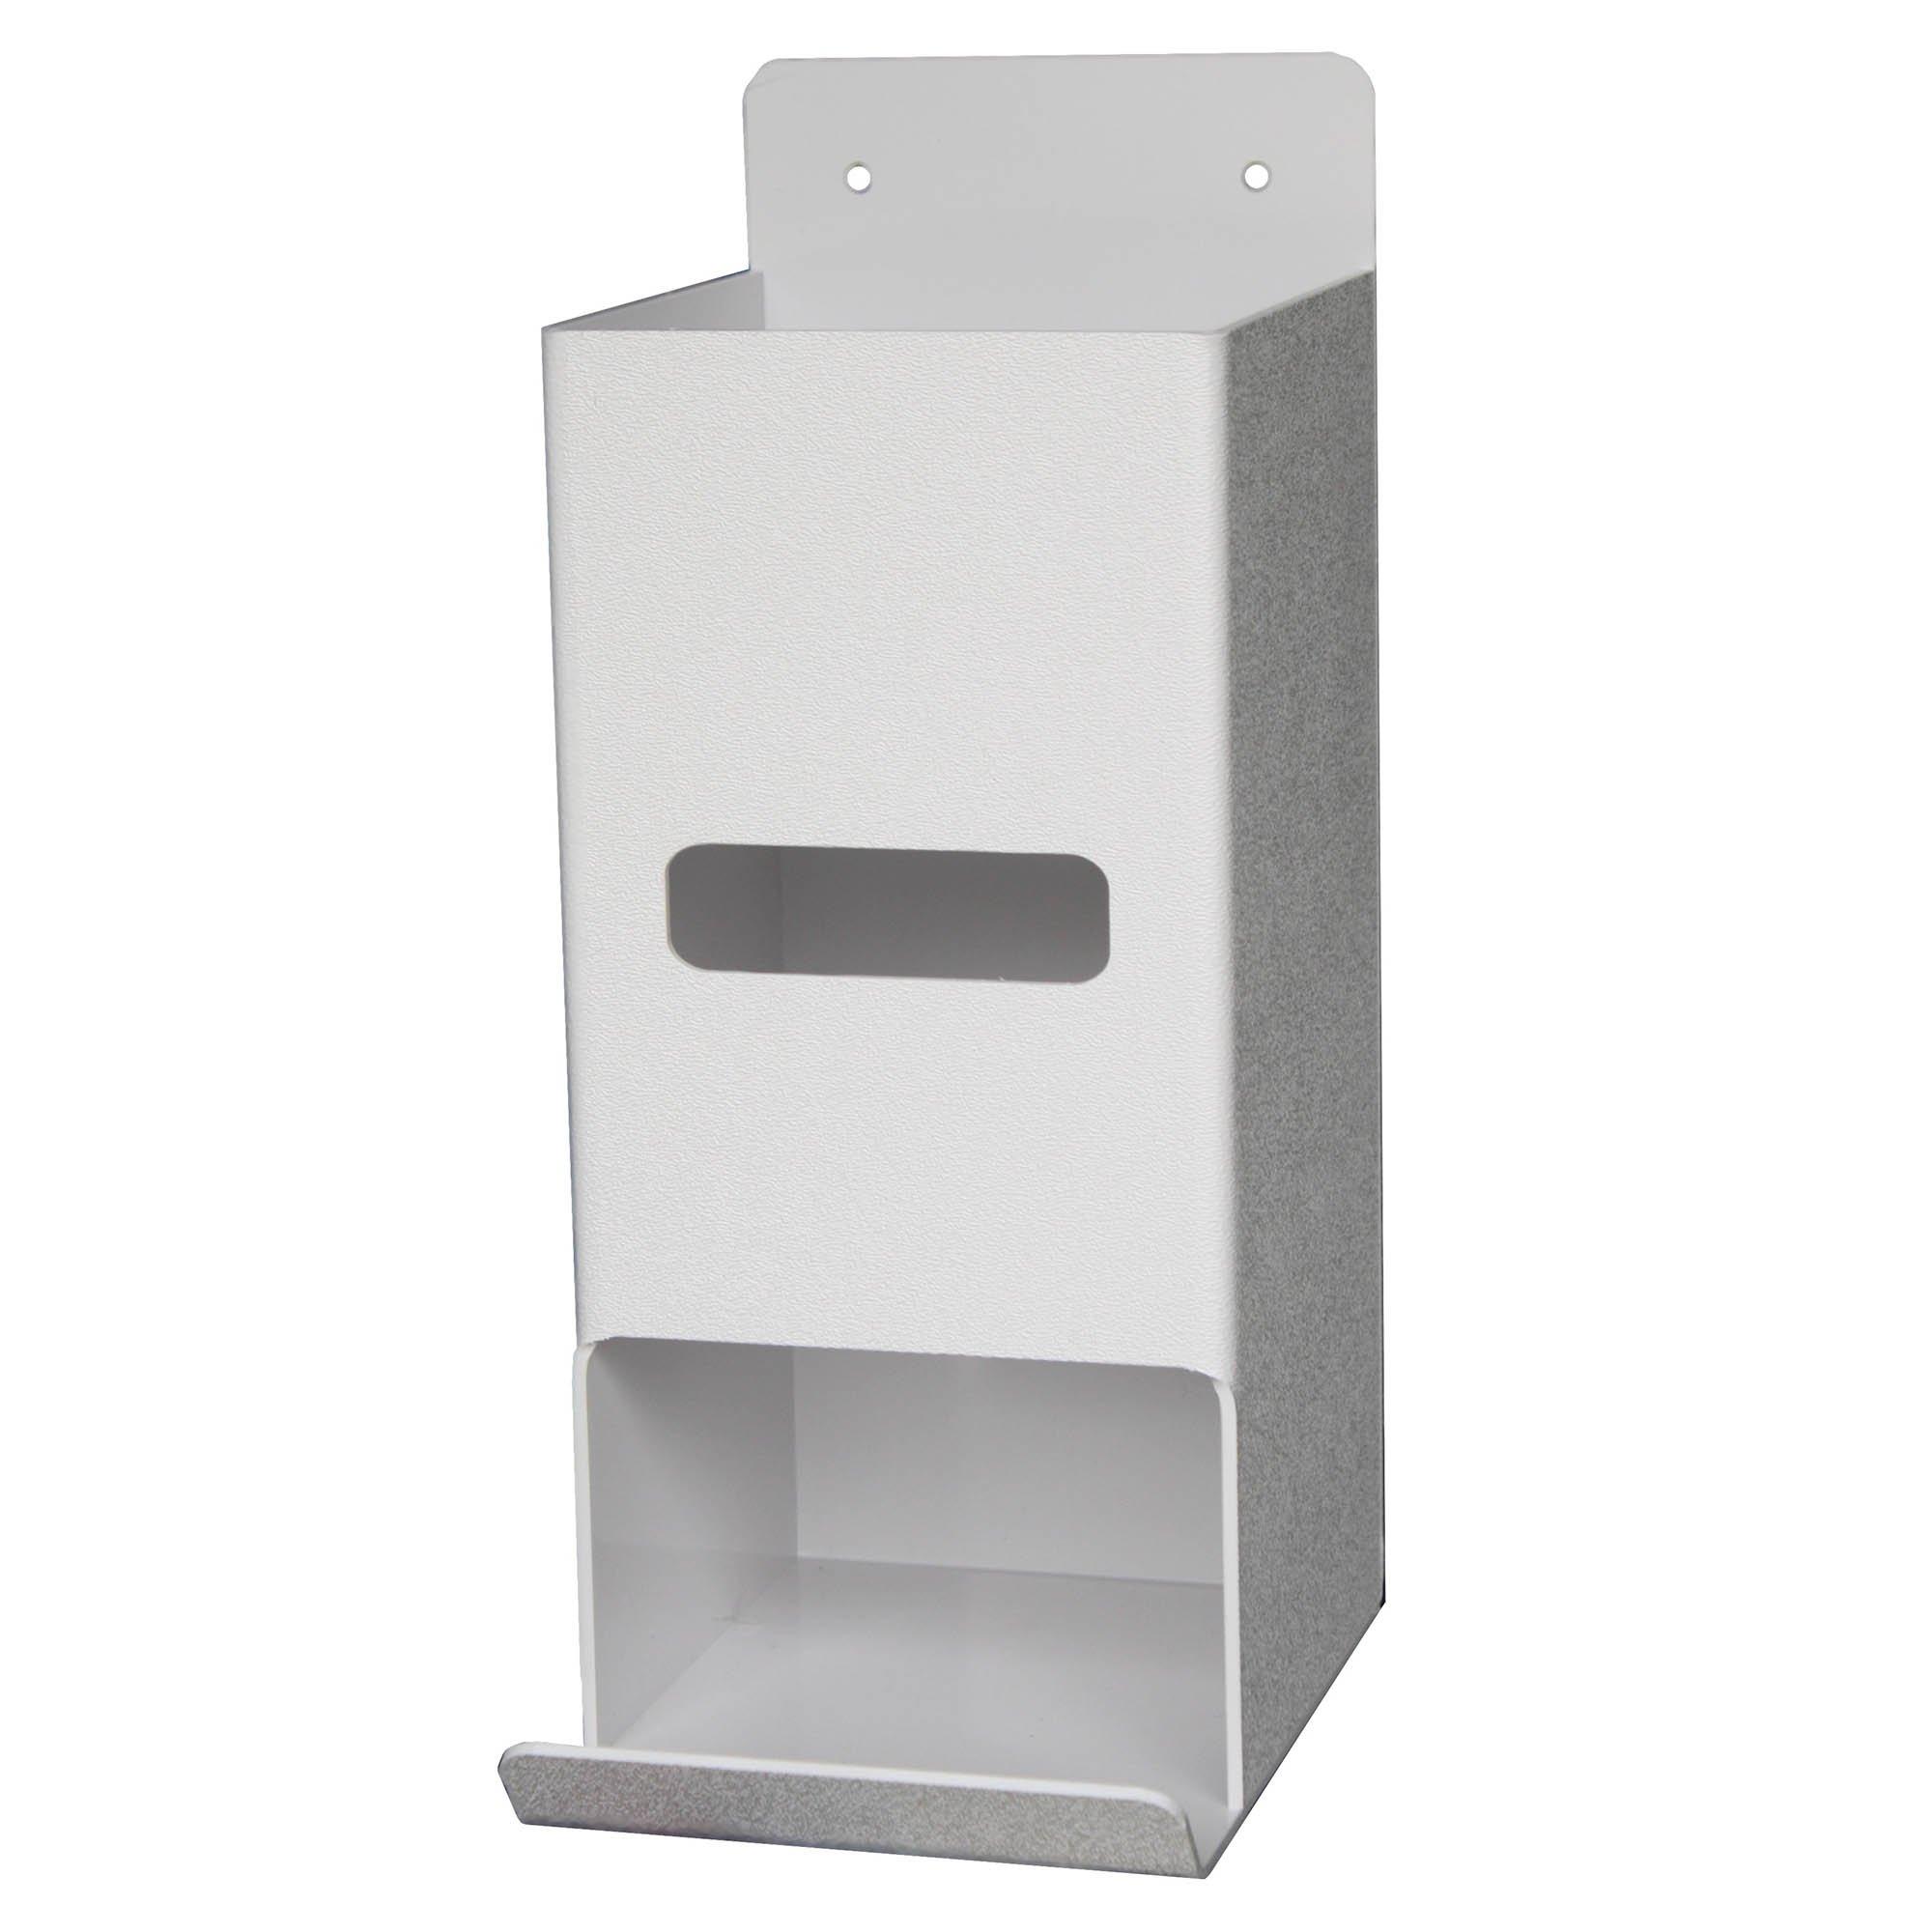 Surgical Scrub Brush Dispenser - White ABS